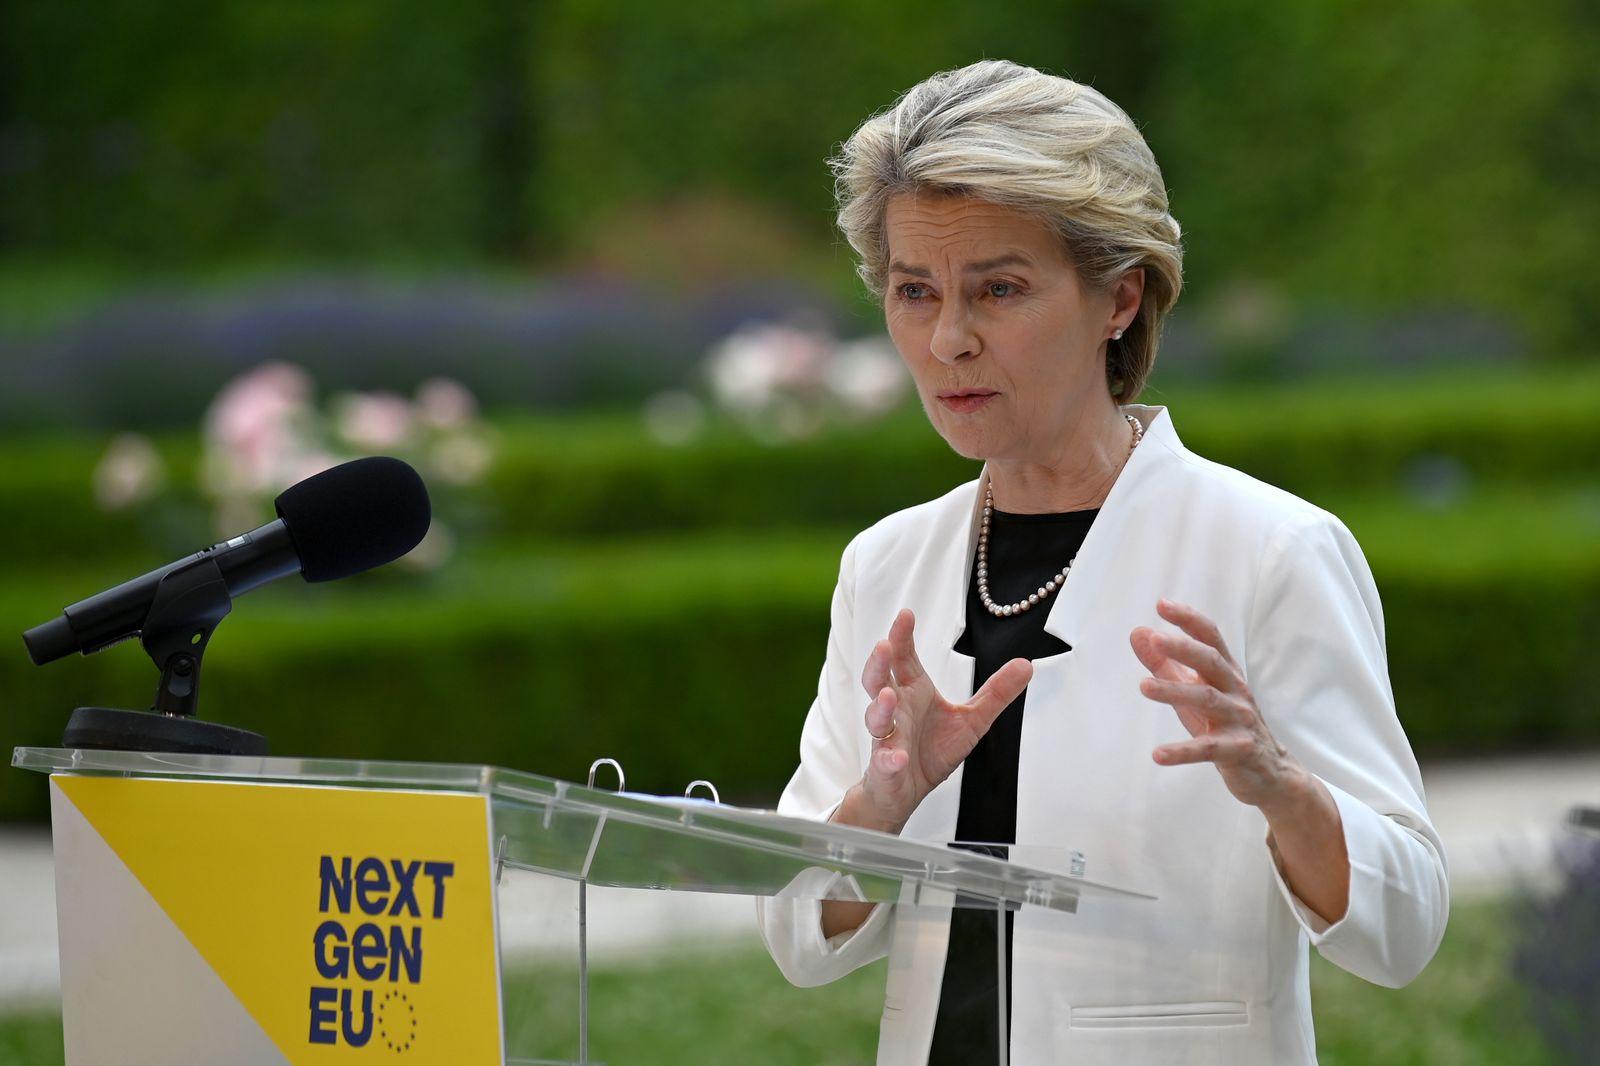 Ursula von der Leyen Visits Austria As Part Of EU Tour